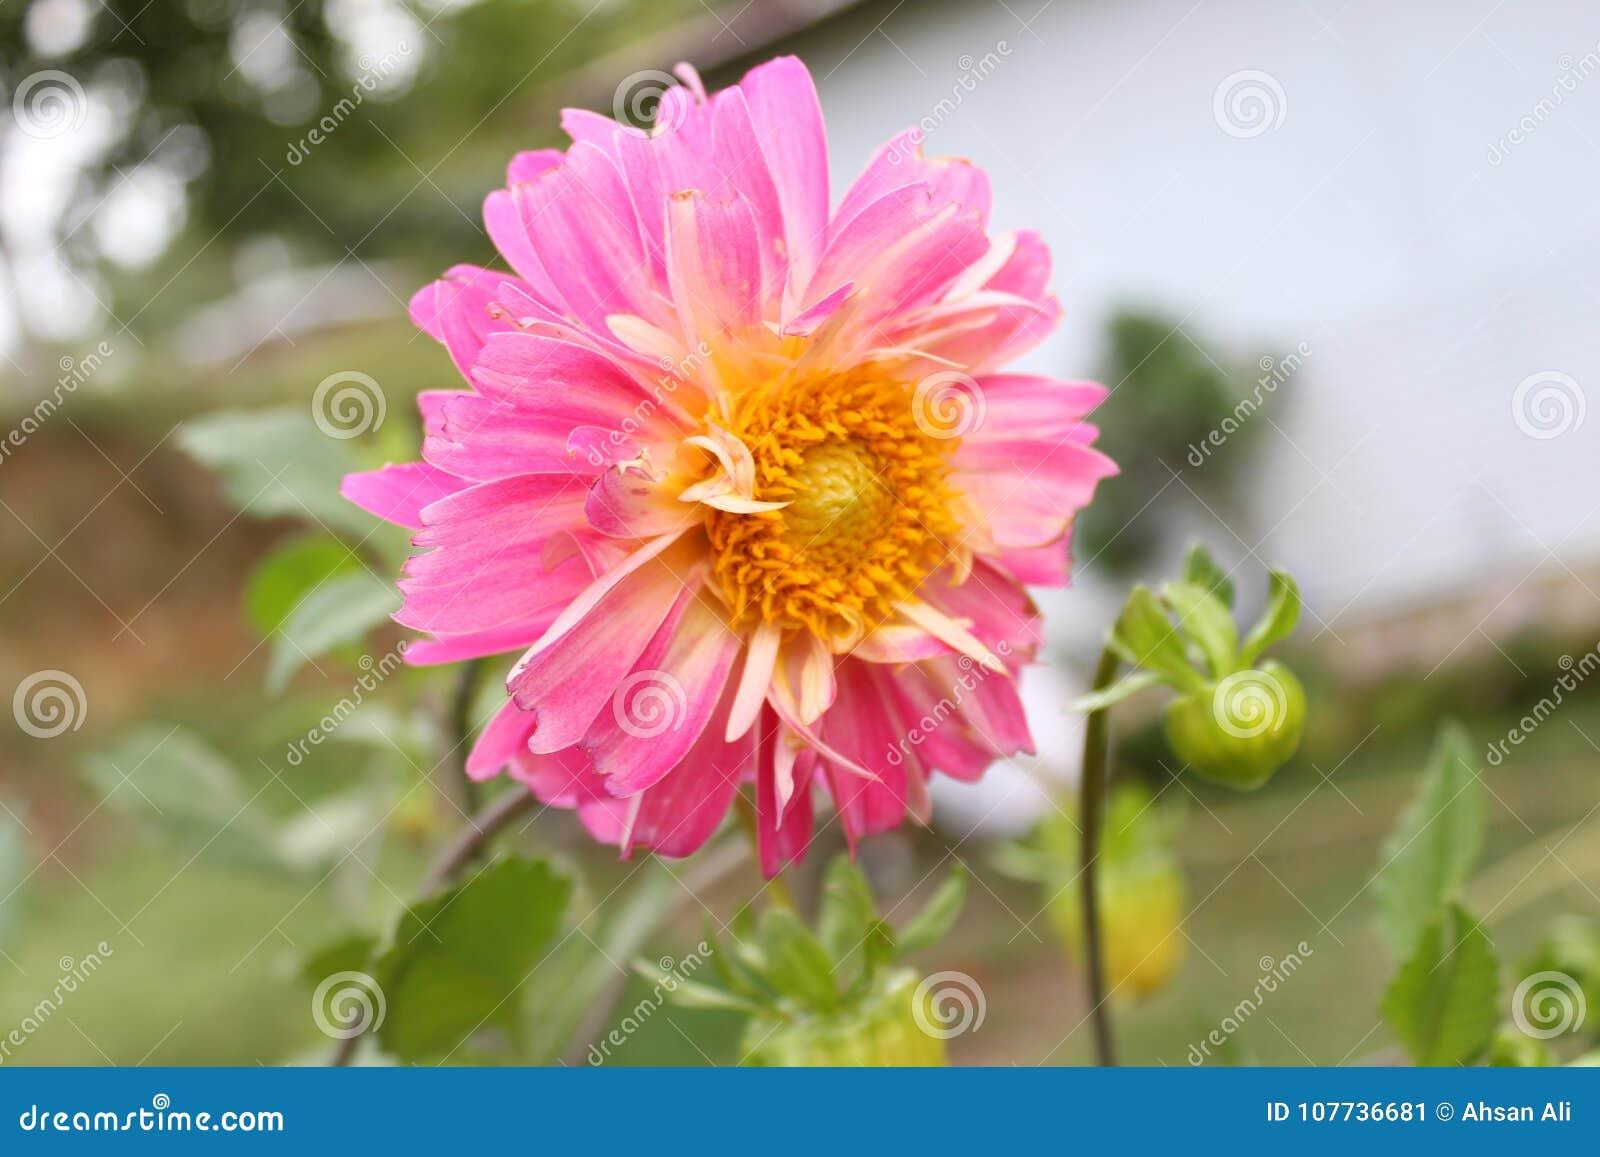 Pink dahlia flower in the himalayas mountain stock image image of download pink dahlia flower in the himalayas mountain stock image image of countries bridge izmirmasajfo